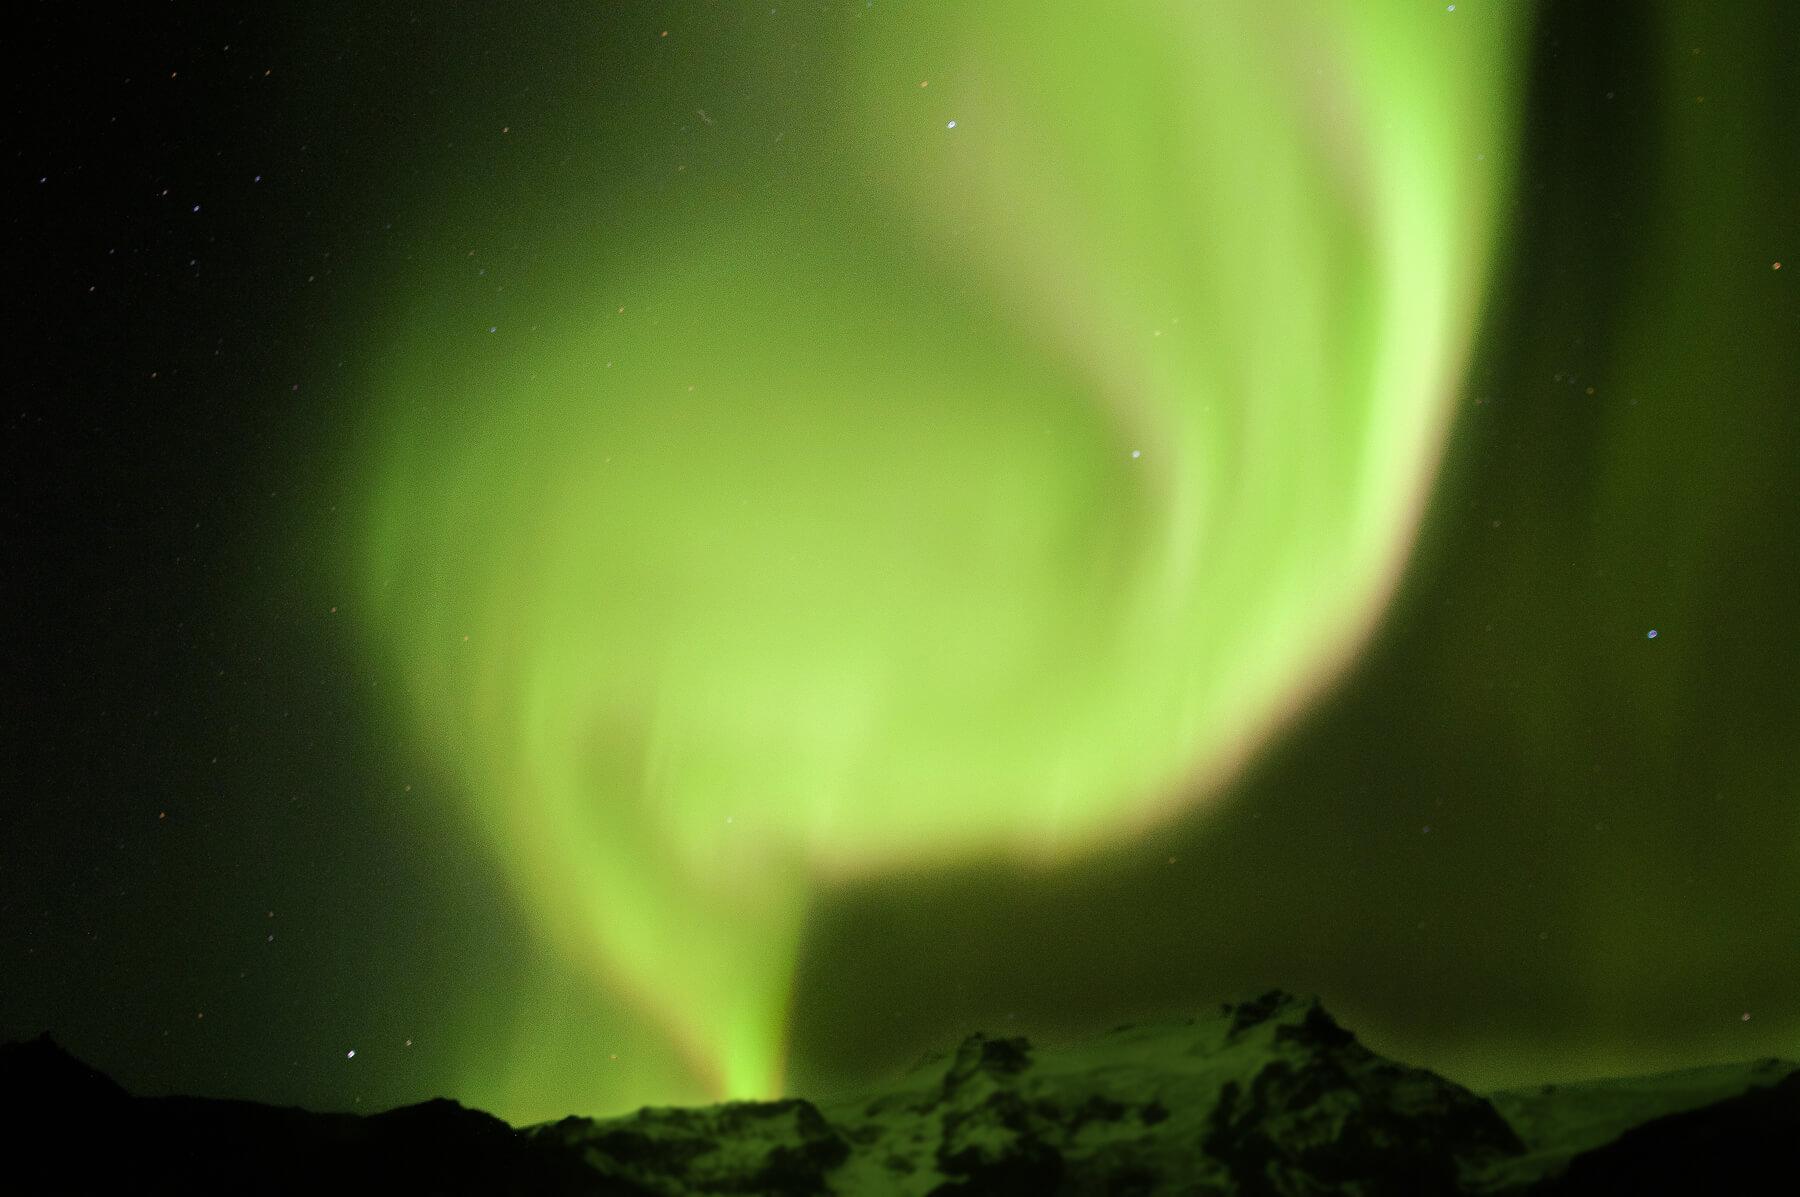 Bright, swirling green aurora heading behind a mountain peak